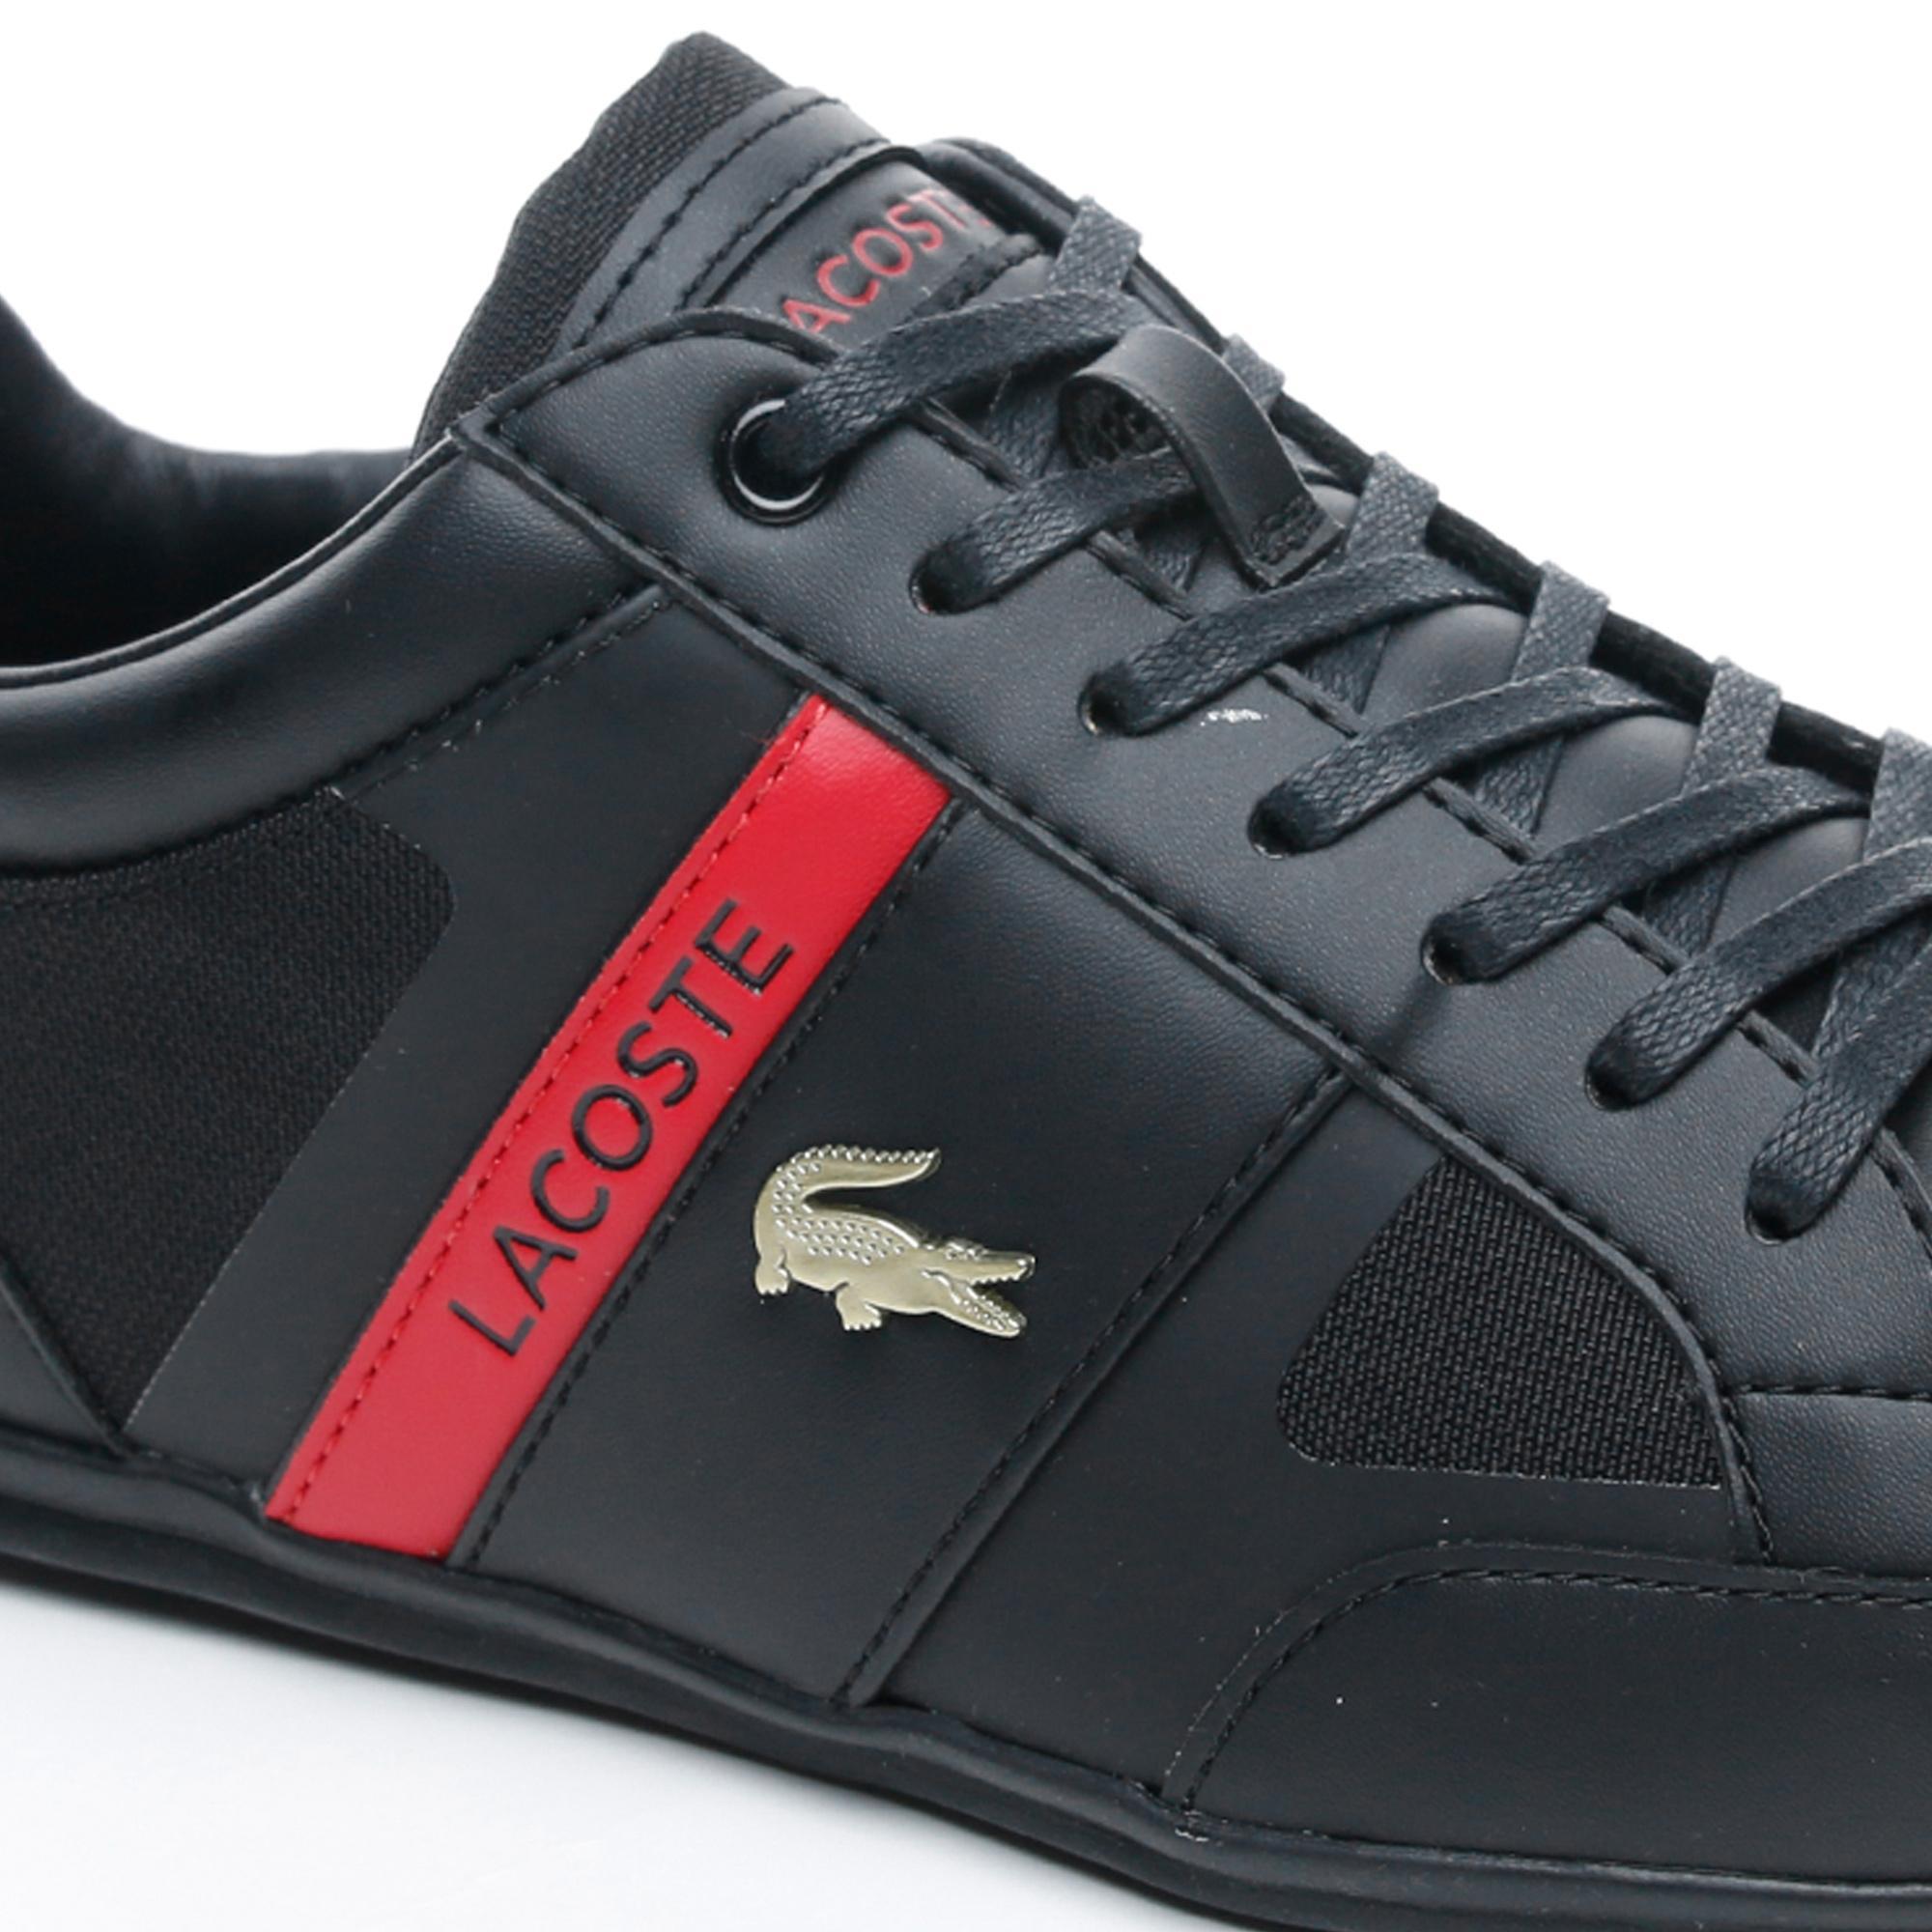 Lacoste Men's Chaymon Tech 0120 3 Cma Casual Shoes